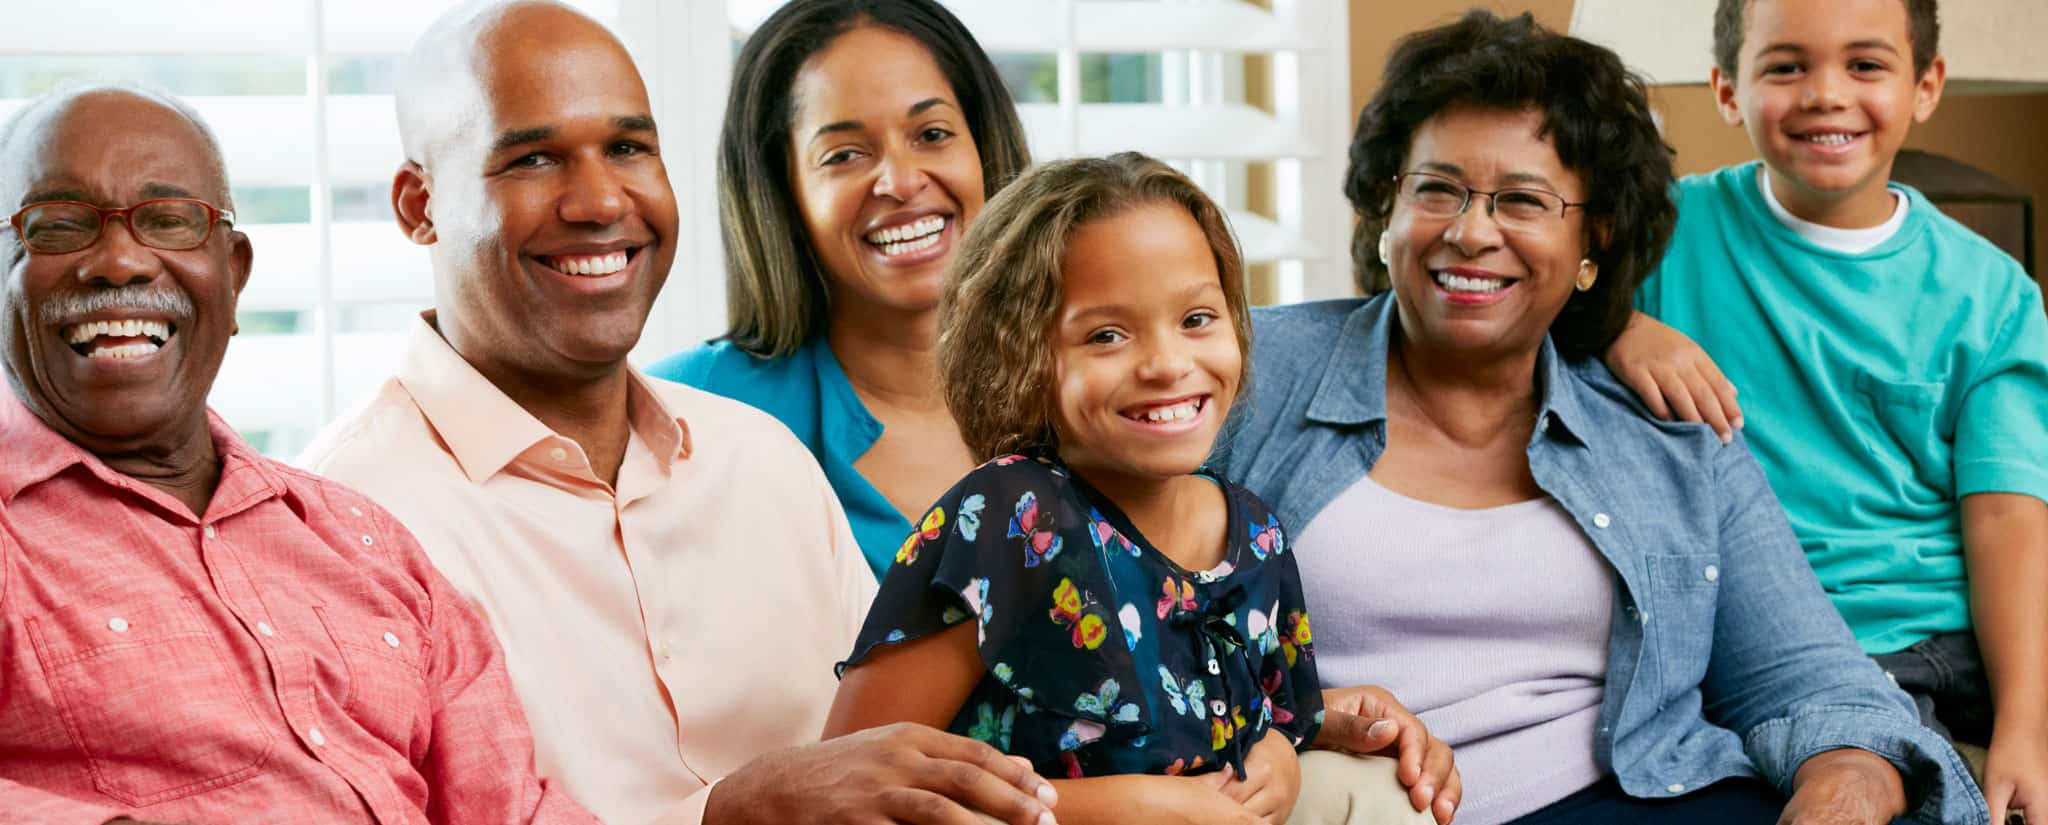 psychonephrology-kidney-nephrology-family-caregiver